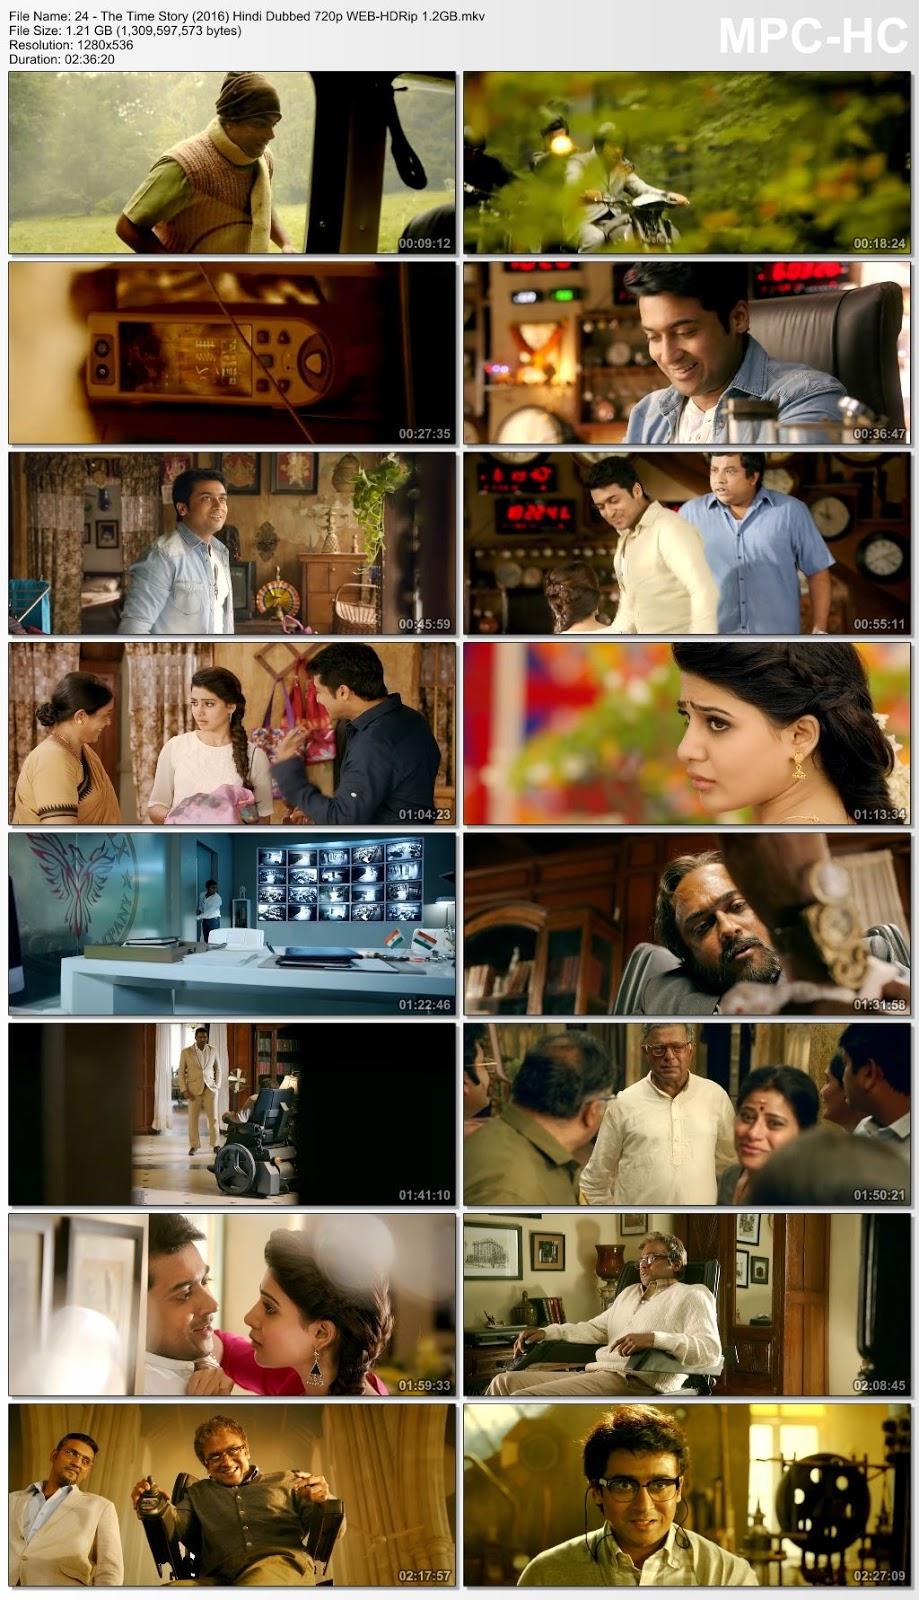 24 – The Time Story (2016) Hindi Dubbed 720p WEB-HDRip 1.2GB Desirehub